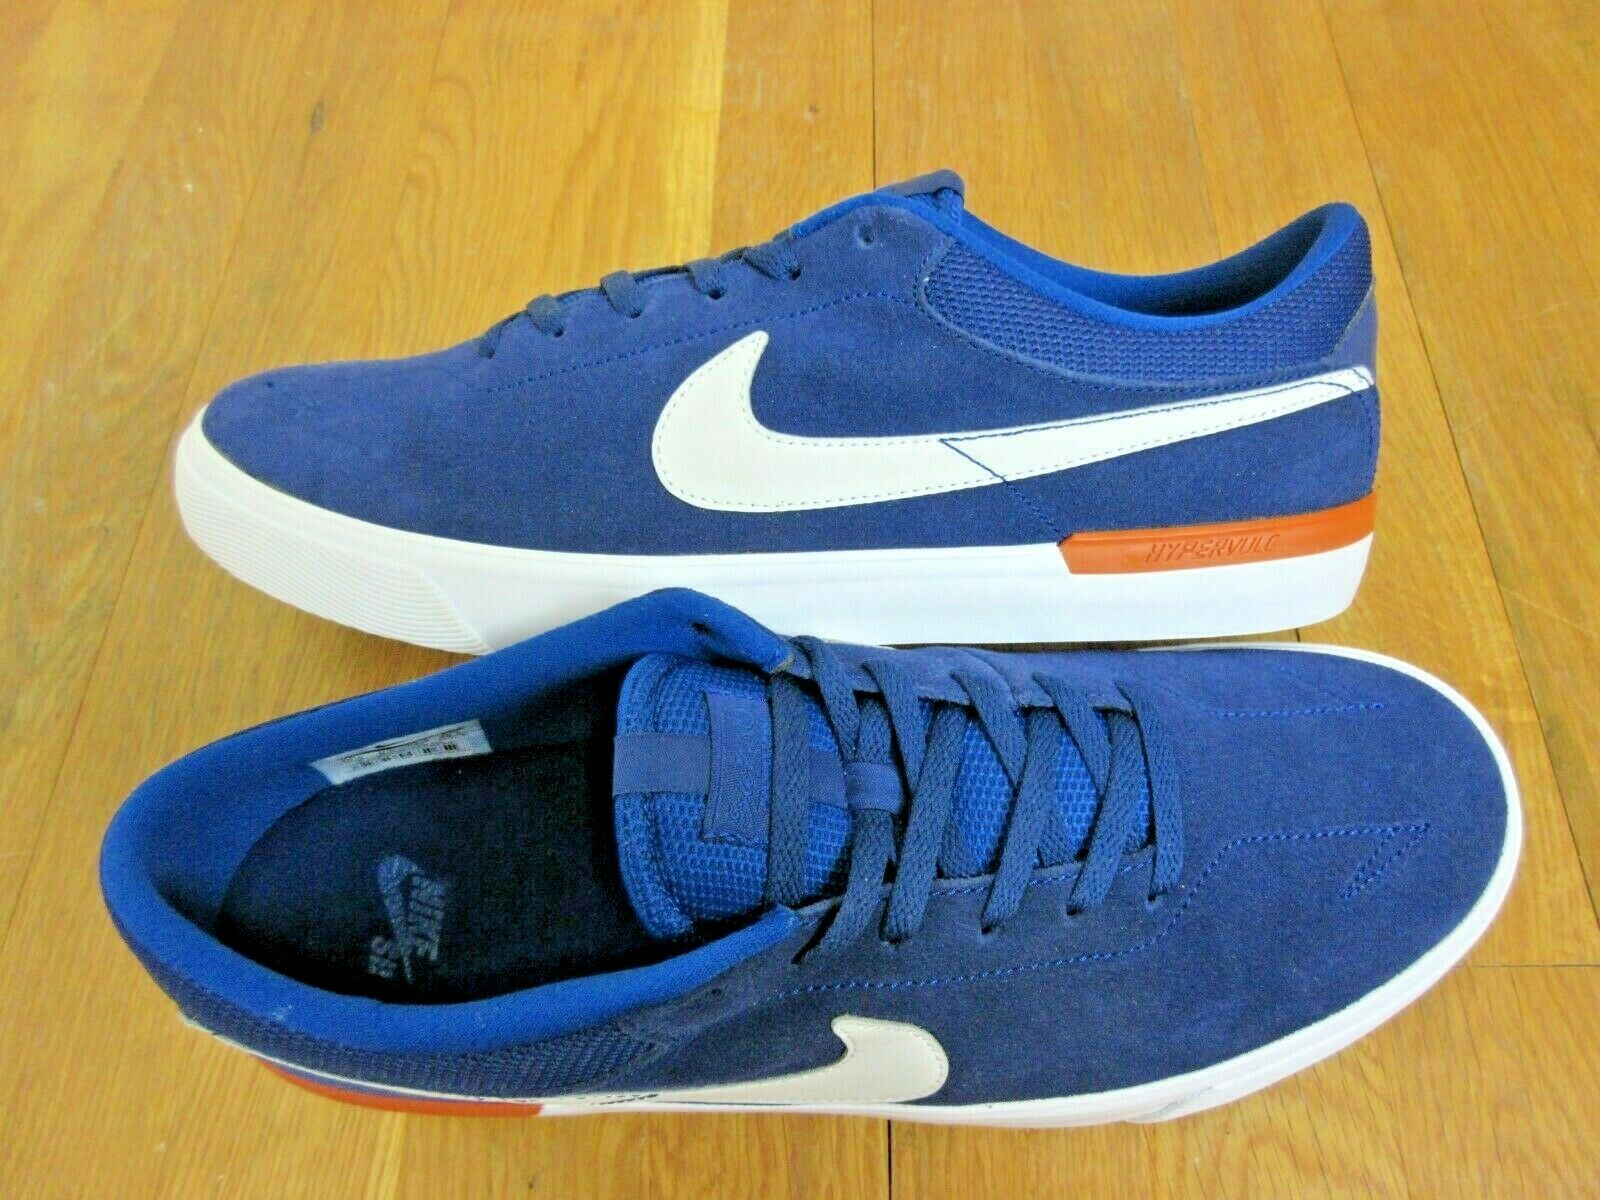 Nike SB Mens Koston Hypervulc Blue Void White Suede Skate Shoes Size 11.5 New